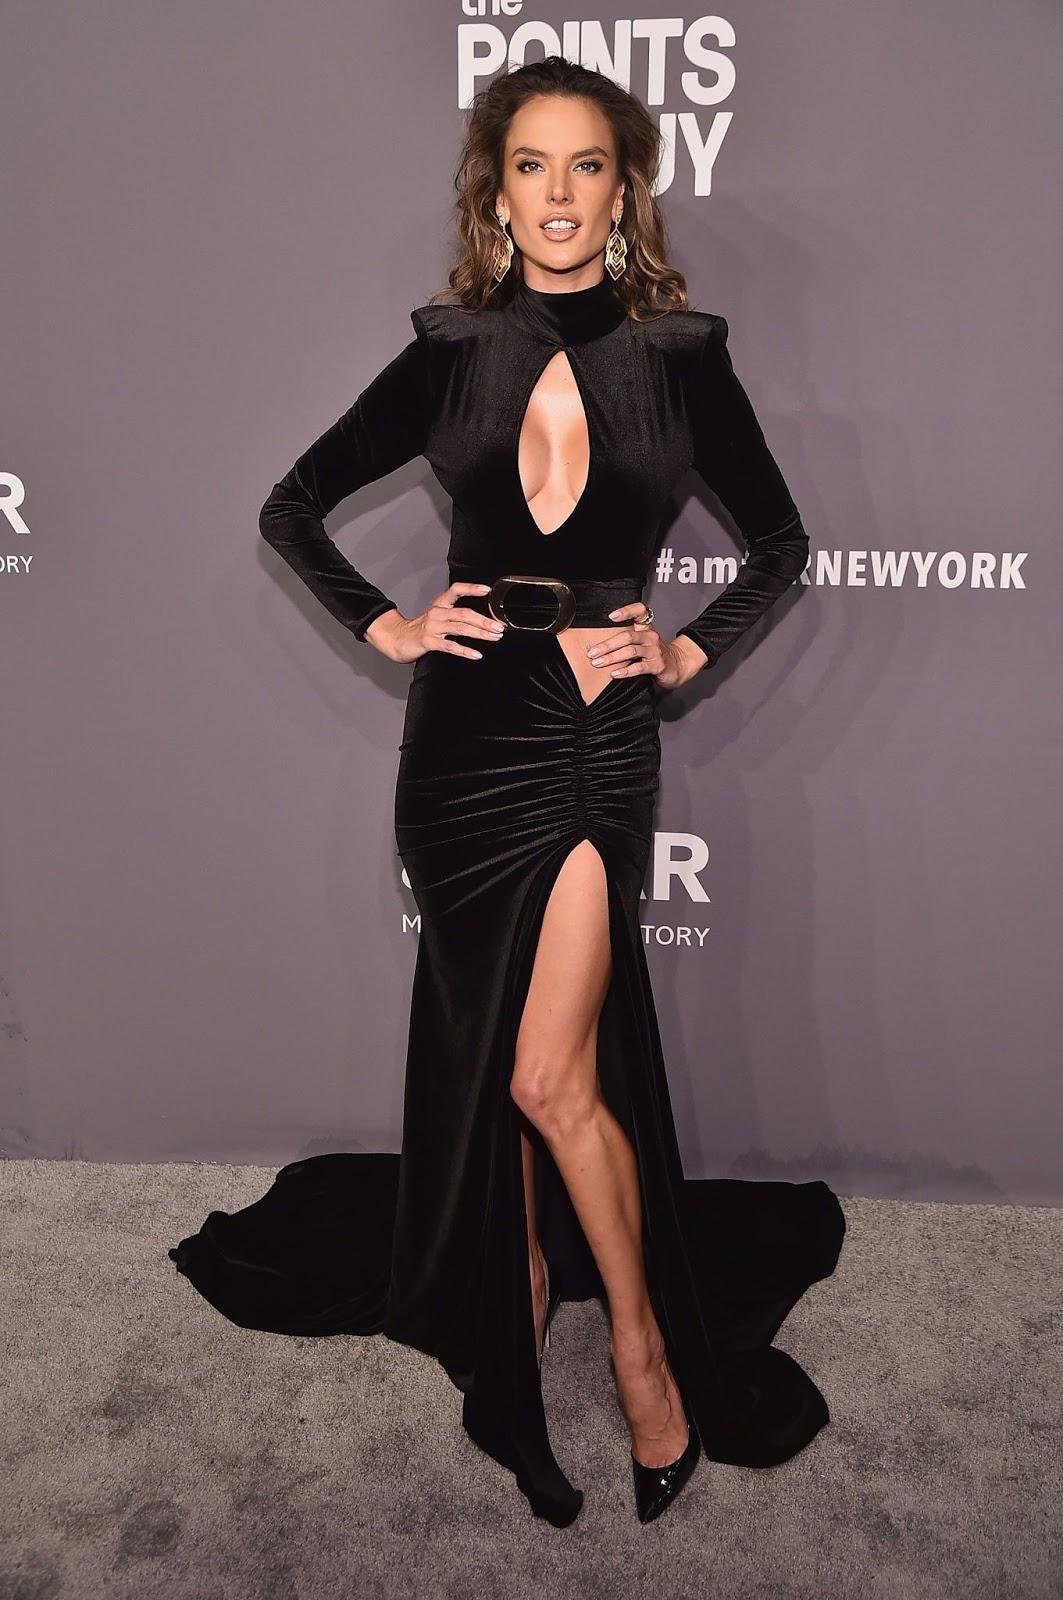 Alessandra Ambrosio - amfAR New York Gala 2019 at Cipriani Wall Street in New York City - February 6, 2019